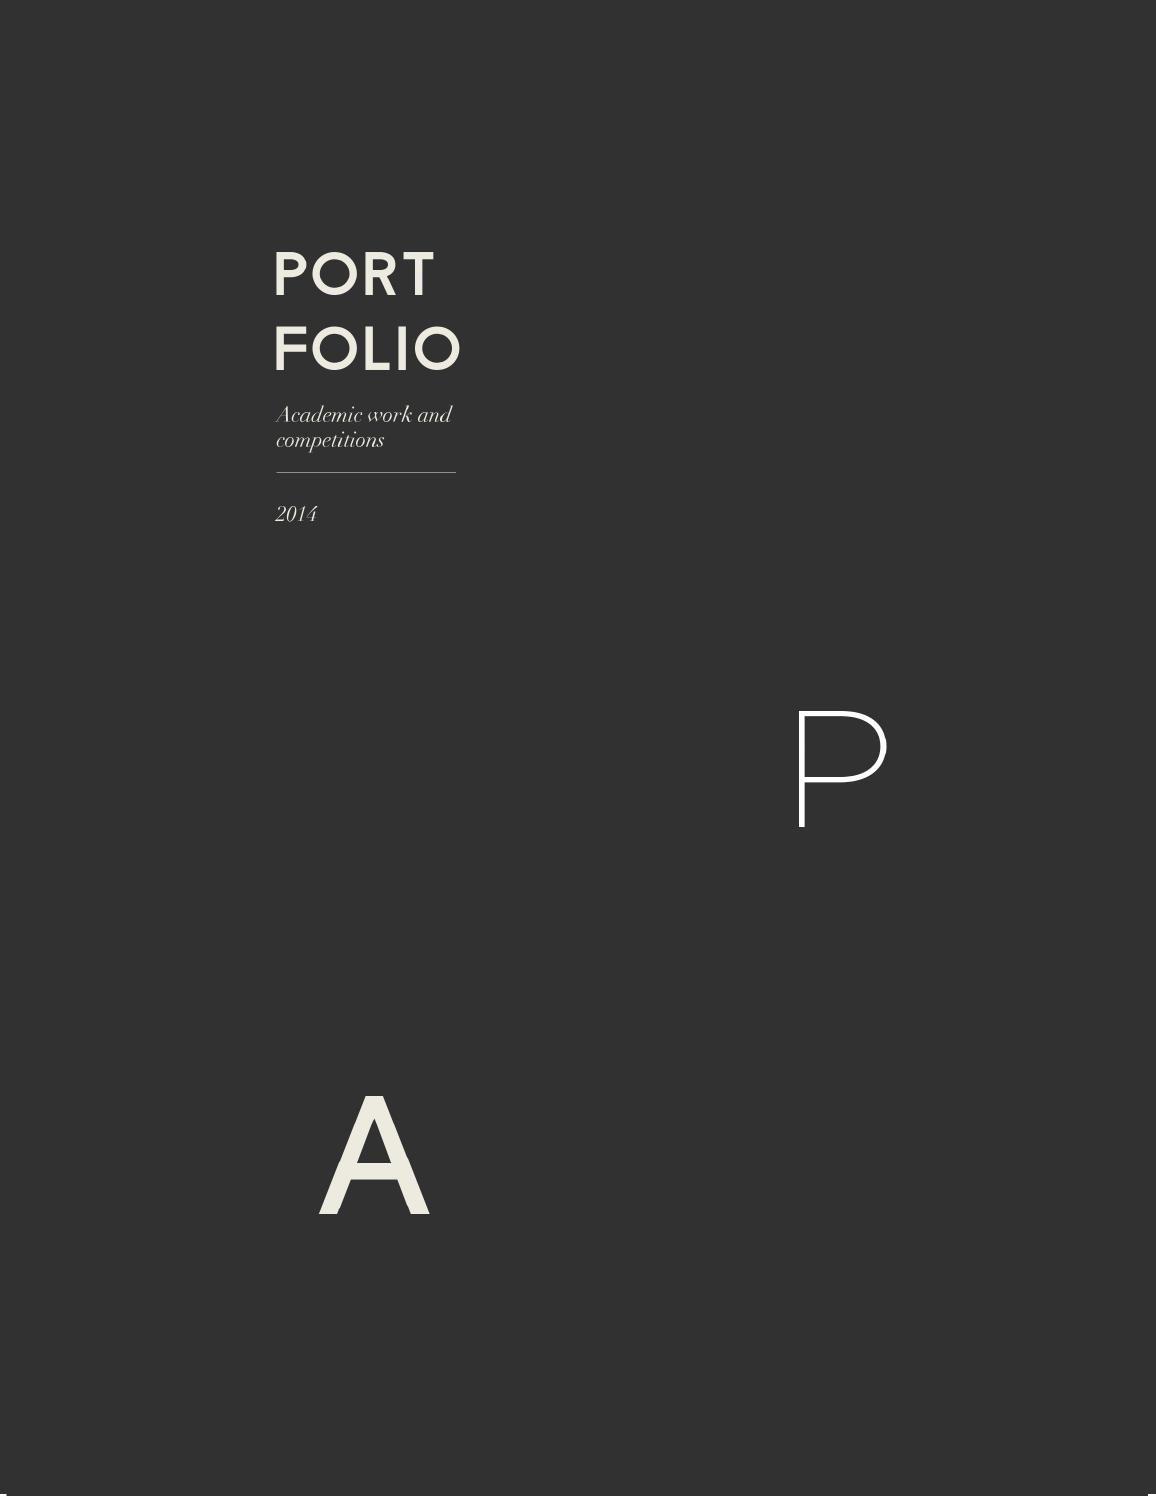 Ana Padrn Portfolio Architecture portfolio Layouts and Architecture